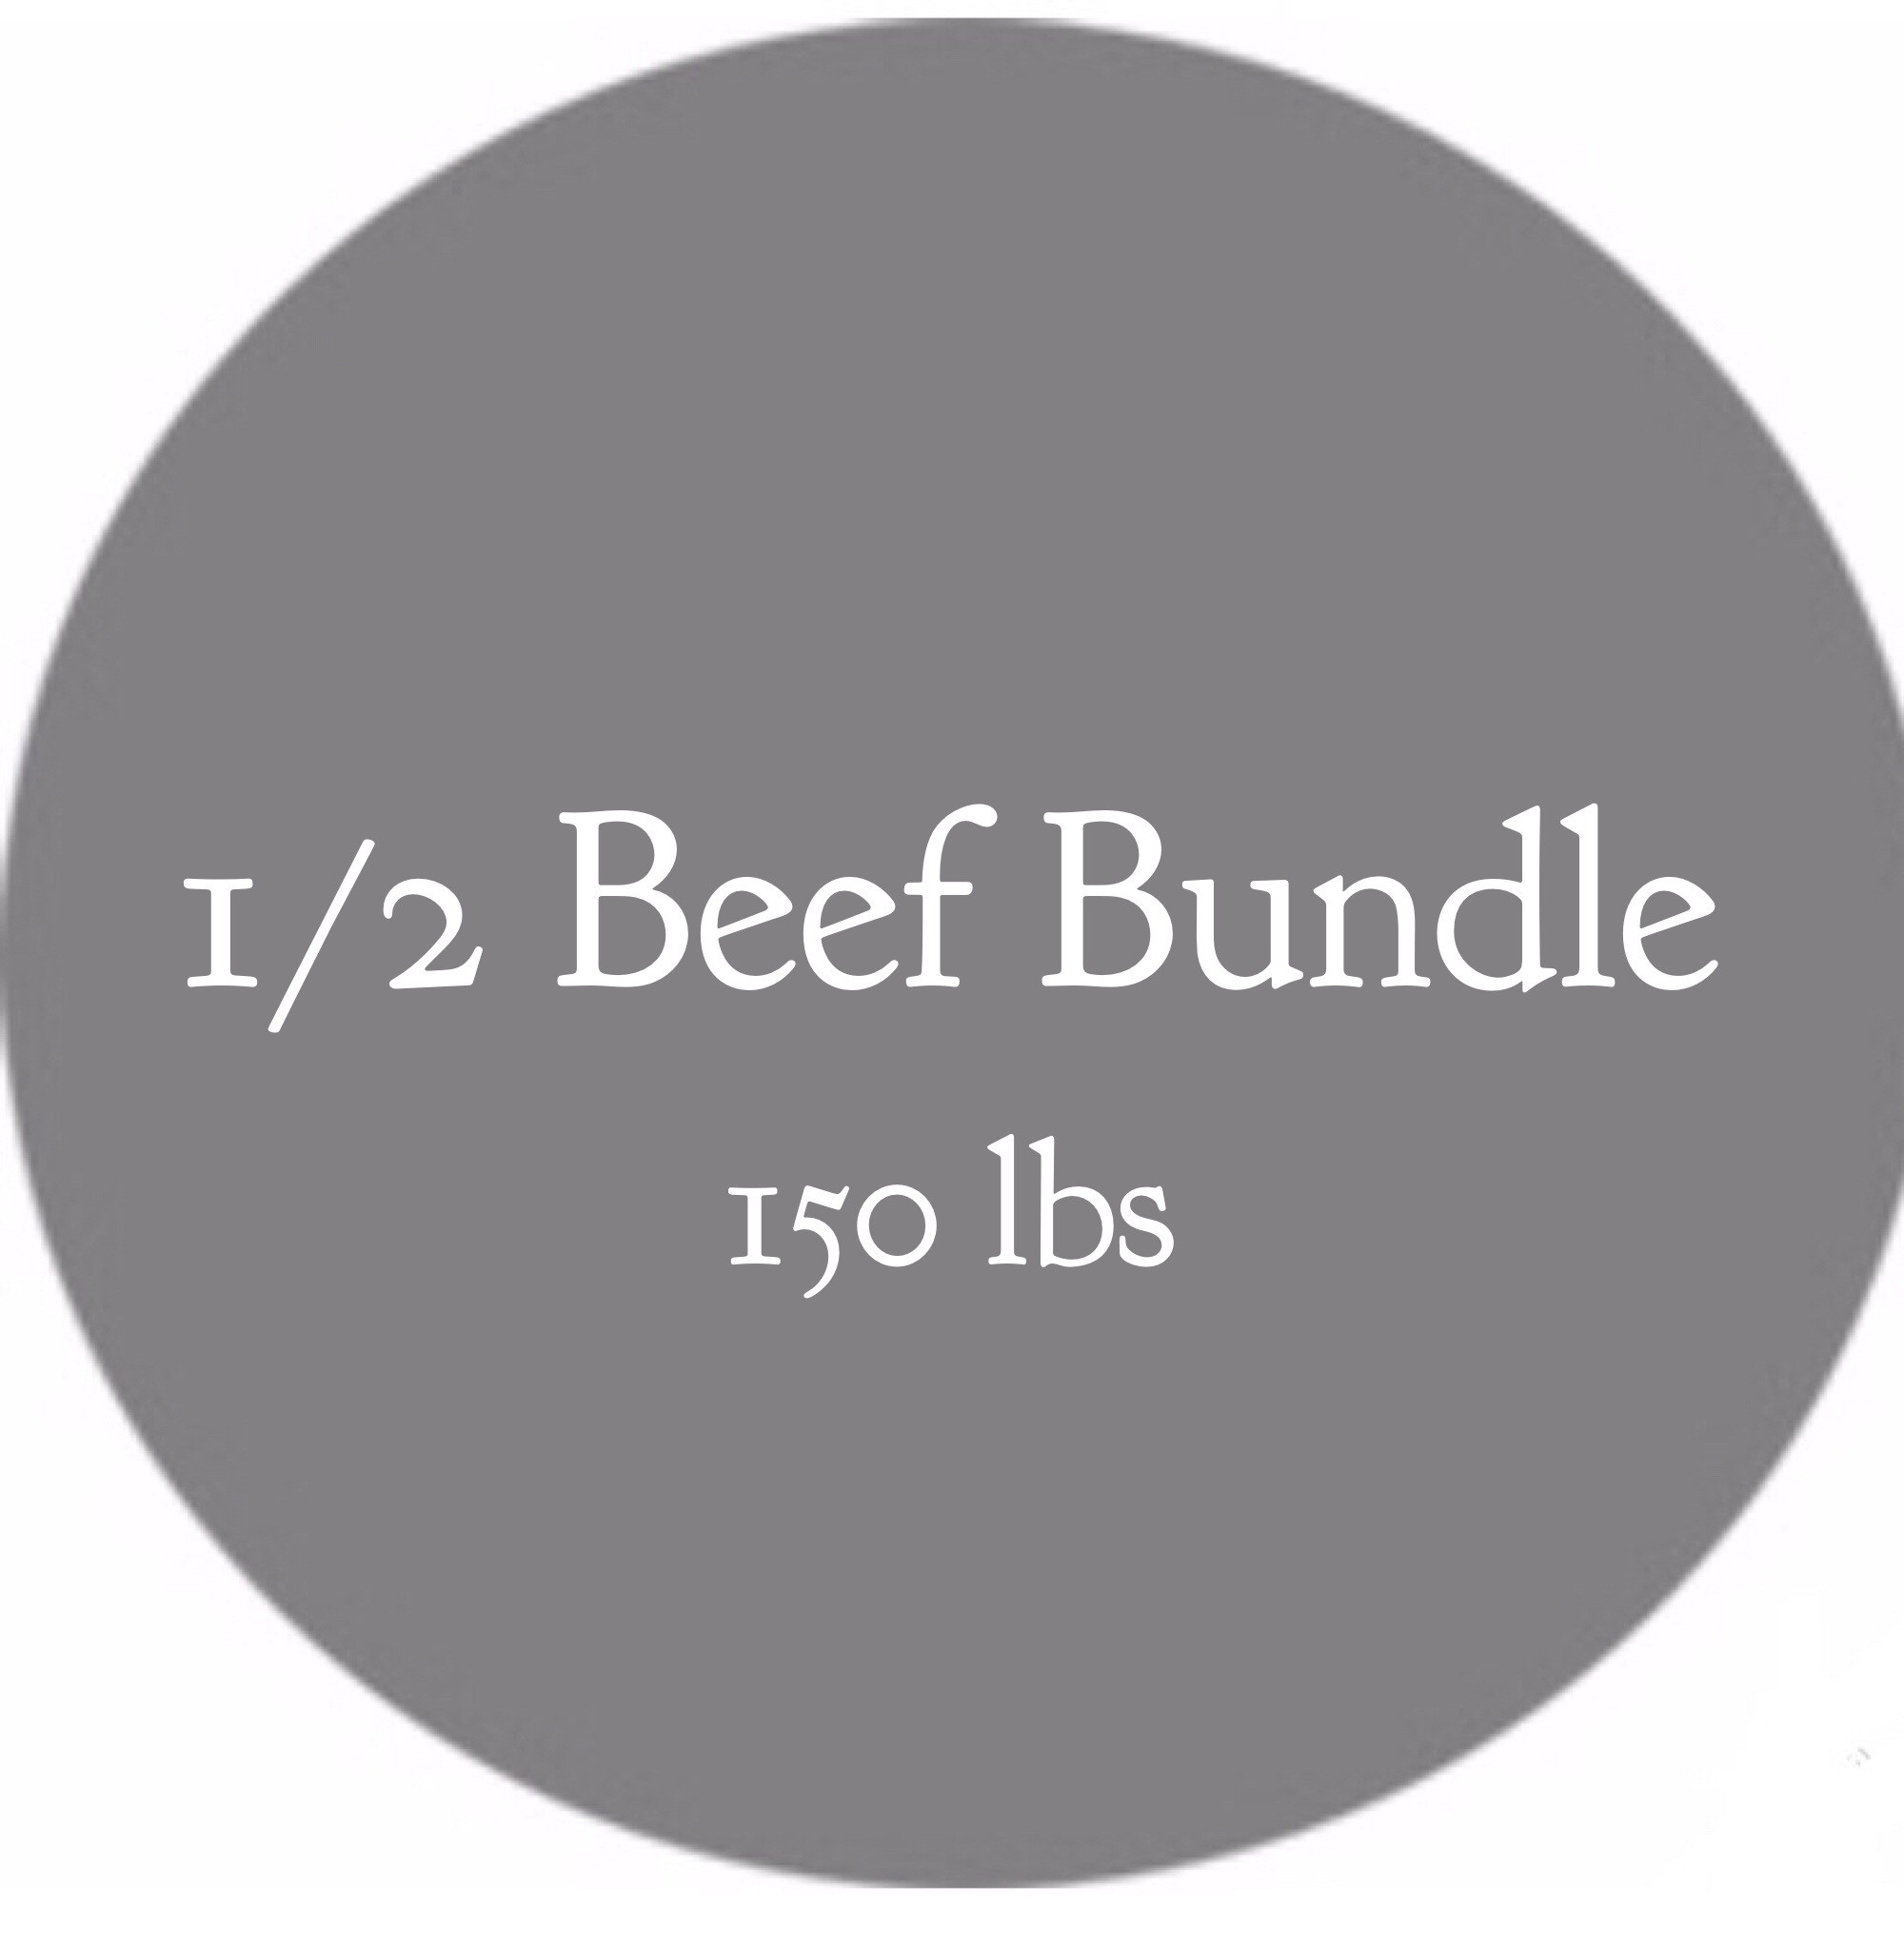 1/2 Beef Bundle- 150 lbs